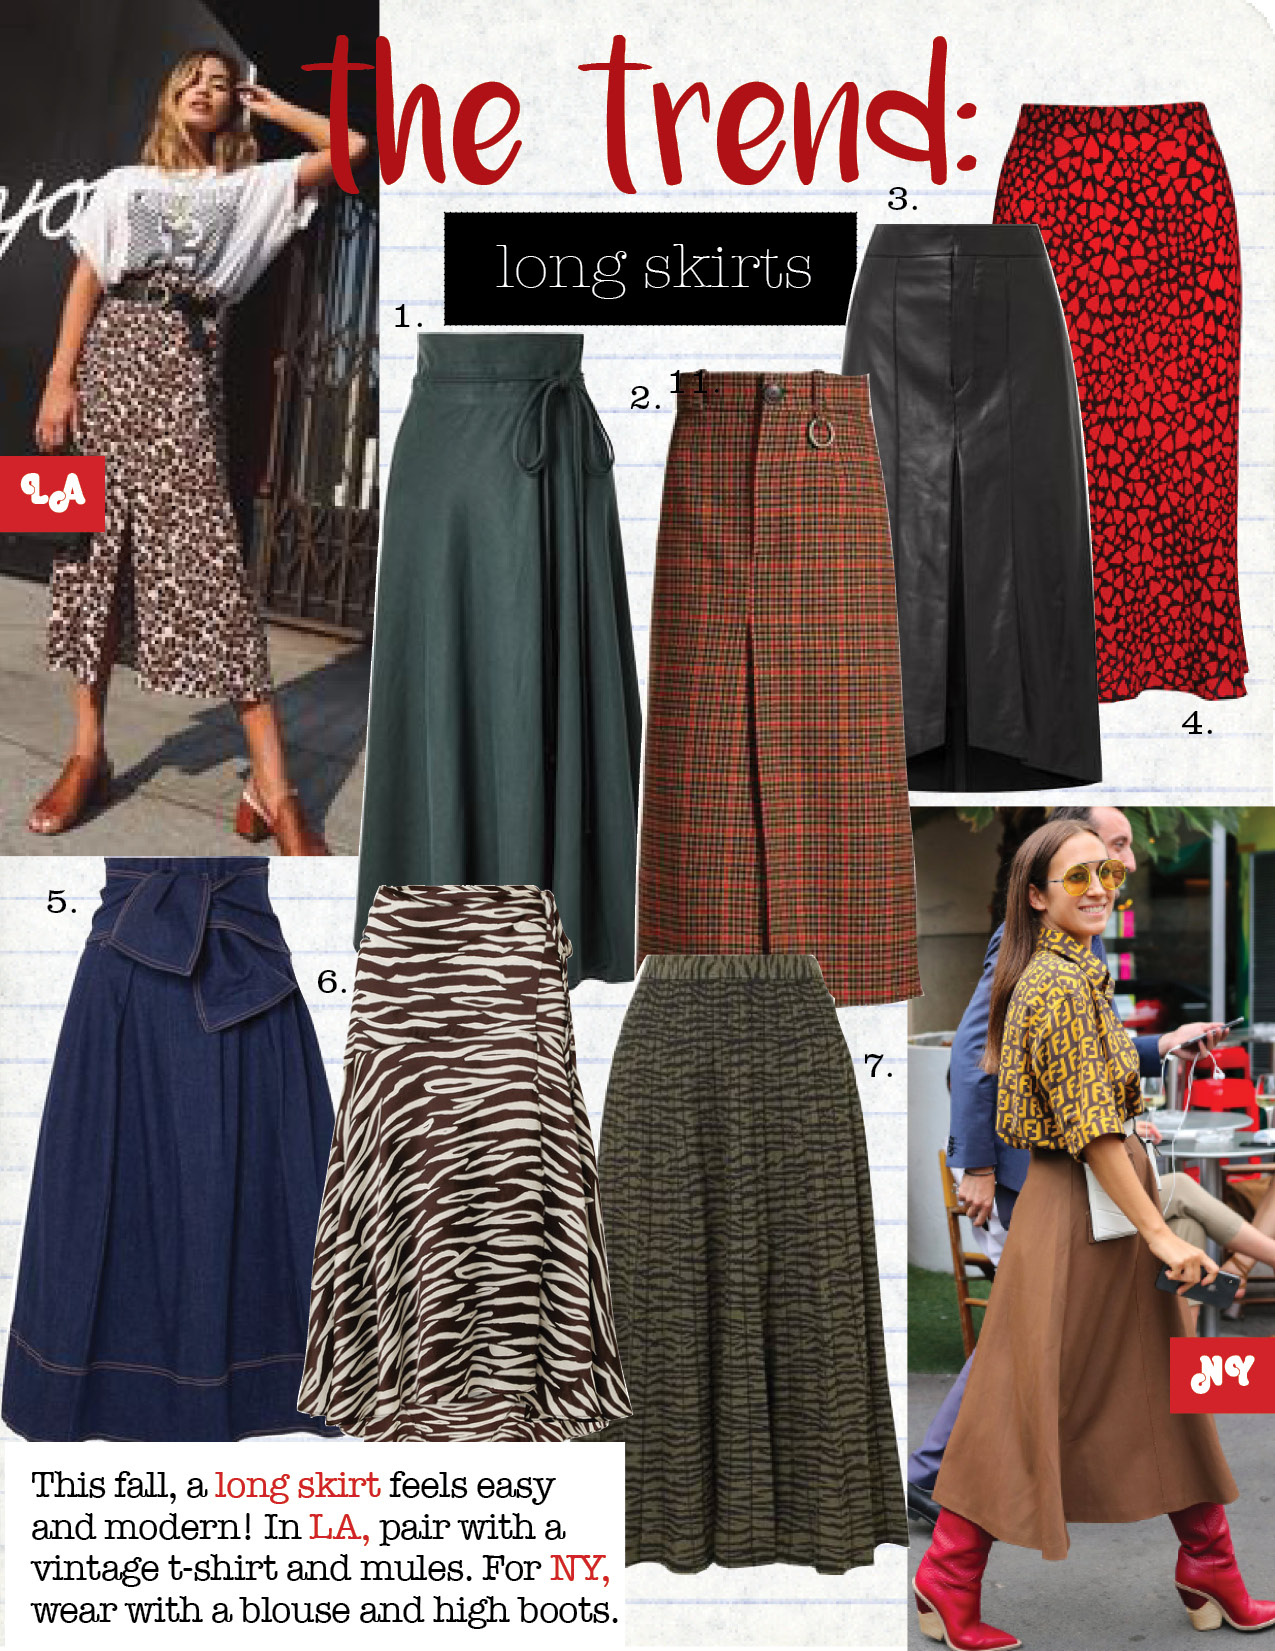 1. apiece apart rosehip tencel and linen-blend wrap skirt, $355,  net-a-porter.com  2. balenciaga wool herringbone checked skirt, $1290,  net-a-porter.com  3. isabel marant nehora pleated leather midi skirt, $2490,  net-a-porter.com  4. realisation the naomi - sid skirt, $180,  realisationpar.com  5. ulla johnson virgil belted denim midi skirt, $345,  net-a-porter.com  6. ganni blakely zebra-print stretch-silk satin skirt, $520,  net-a-porter.com  7. proenza schouler pleated jacquard-knit midi skirt, $895,  net-a-porter.com